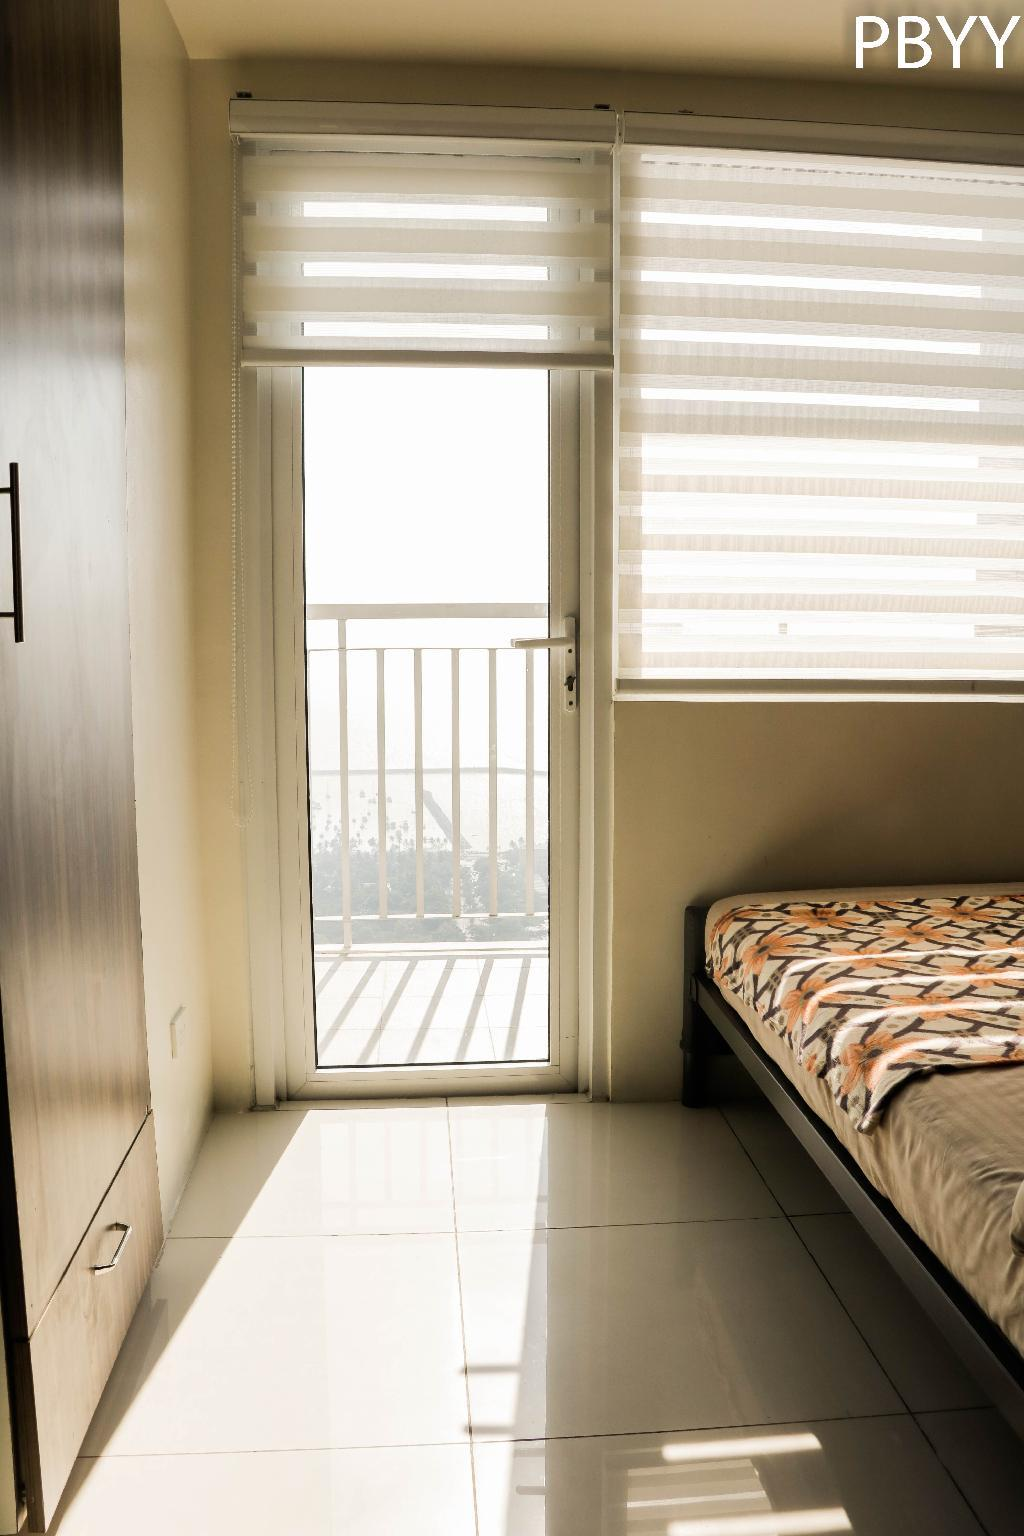 One Bedroom Condo Balcony In Metro Manila Netflix Entire Apartment Deals Photos Reviews